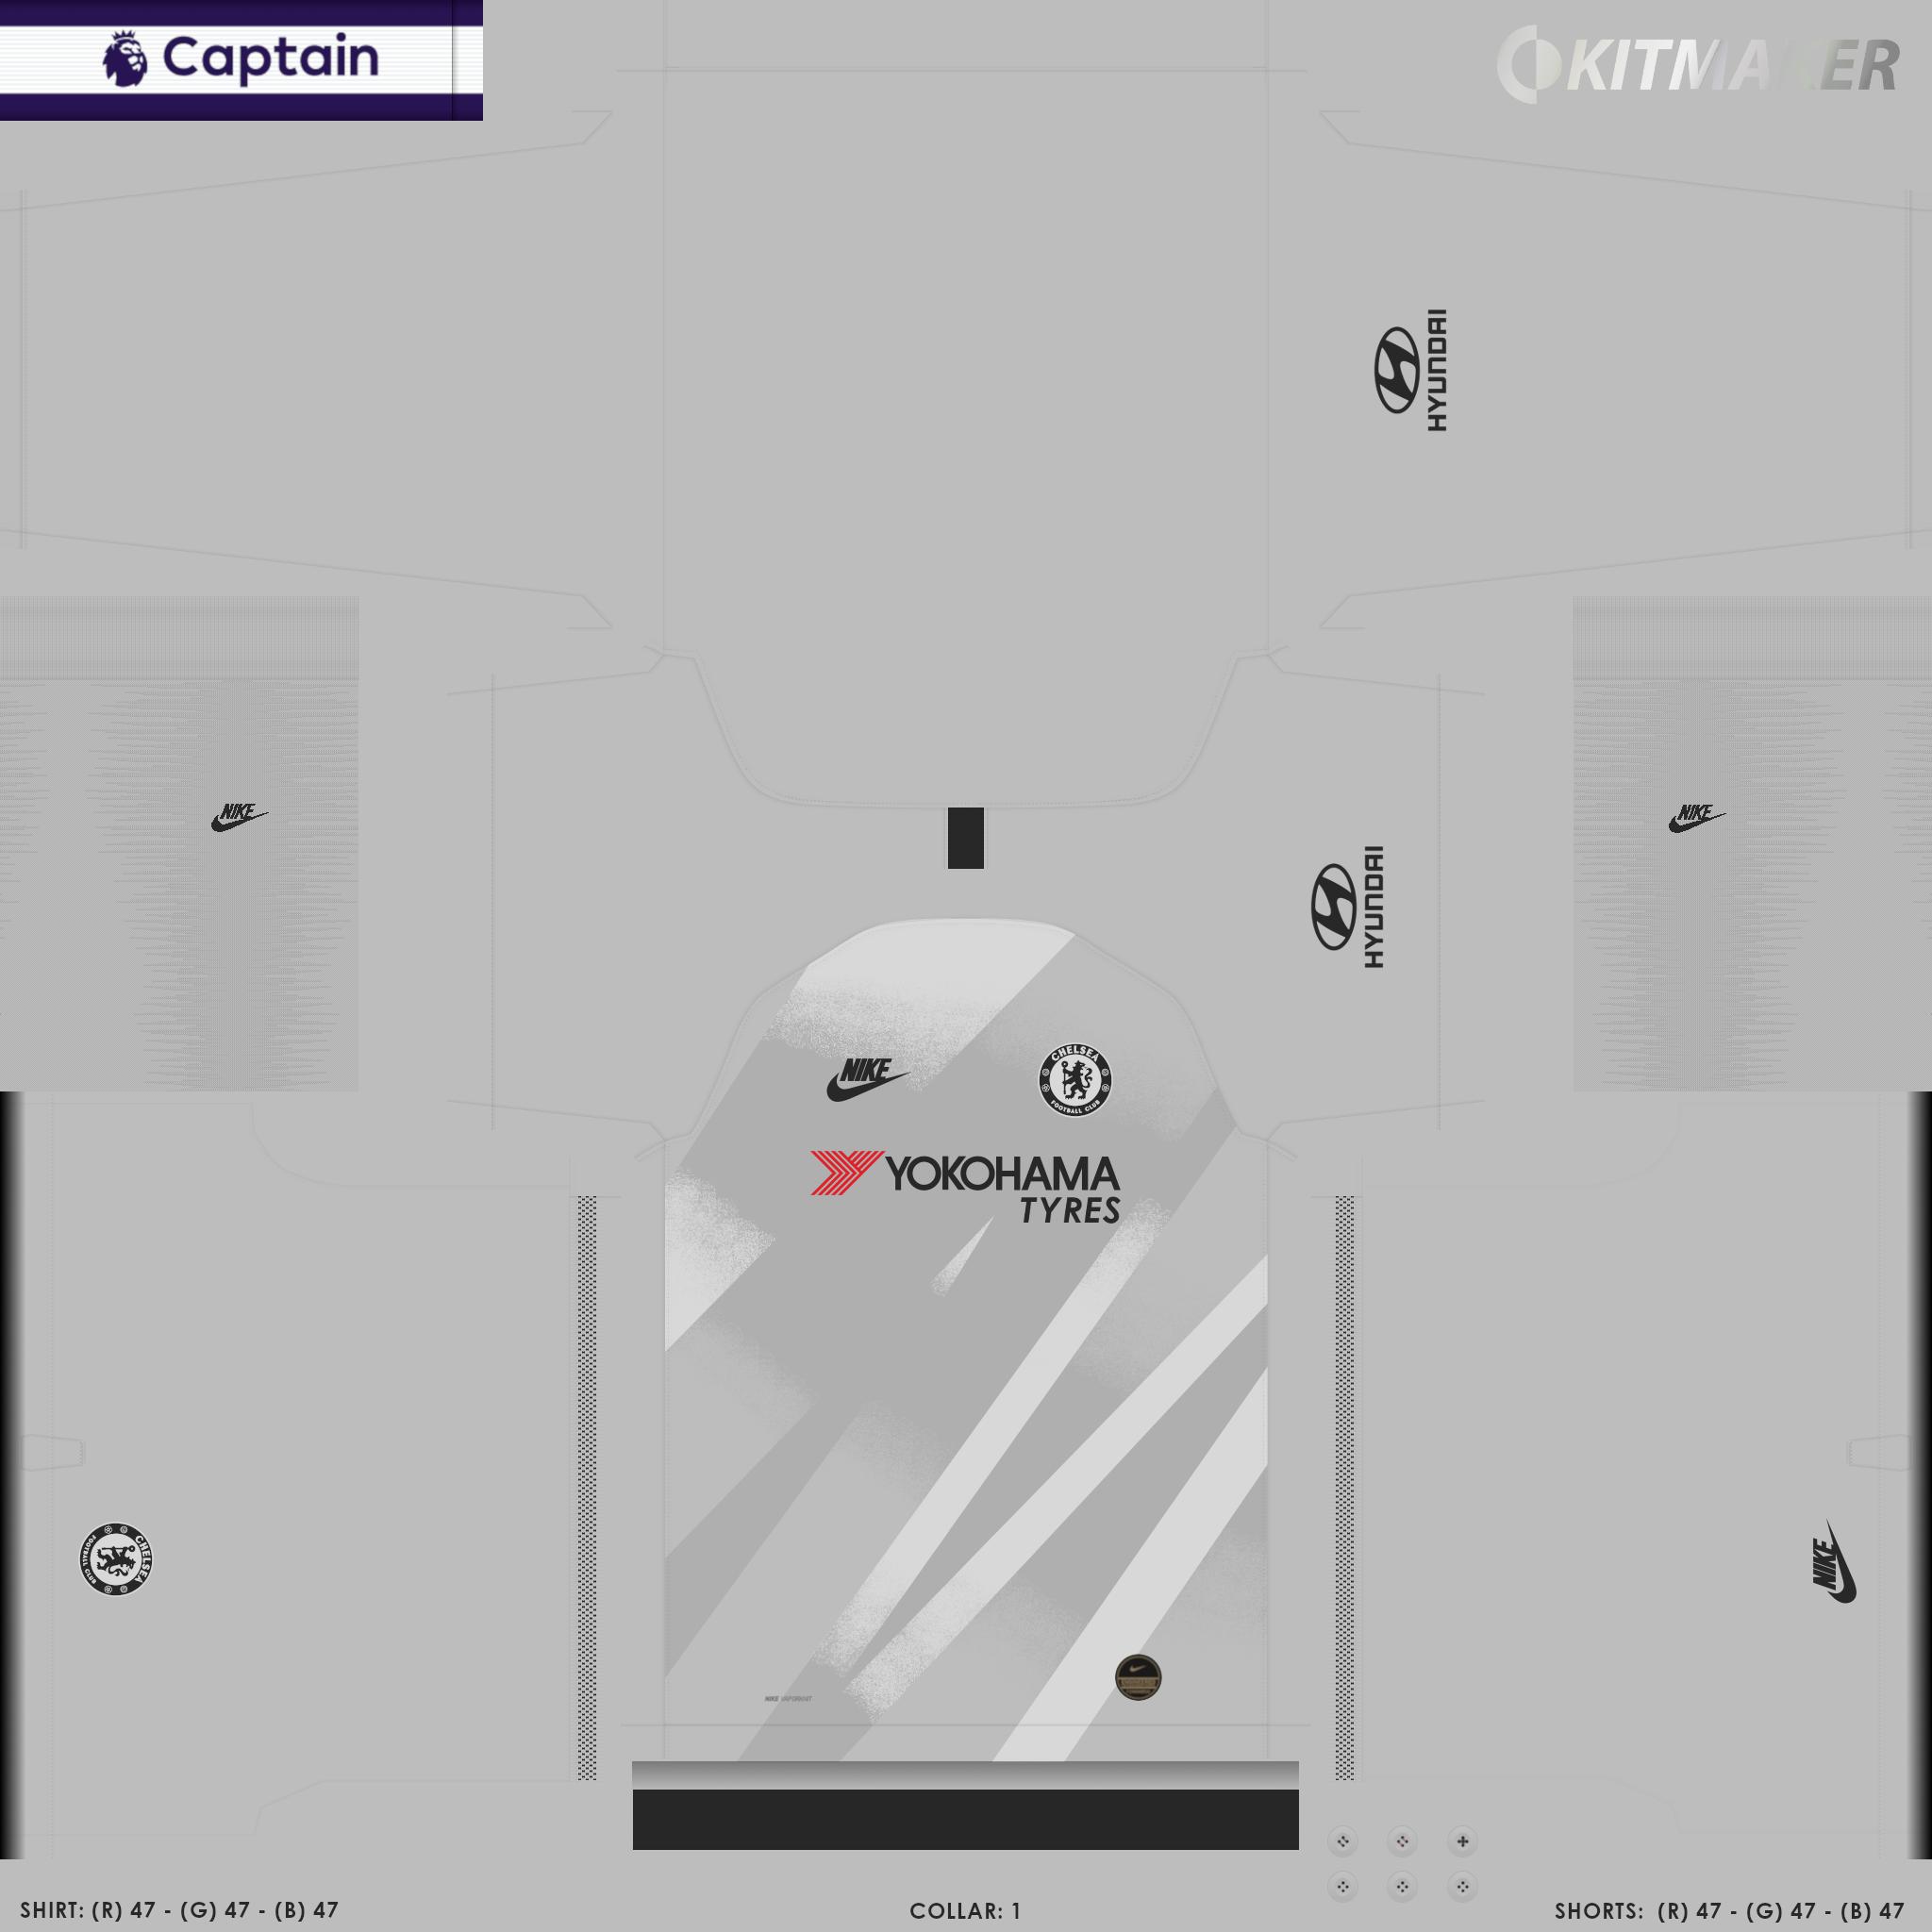 Pes Premier League Kits Pack 2019 2020 Fifamoro In 2020 Football Kits Kit Premier League